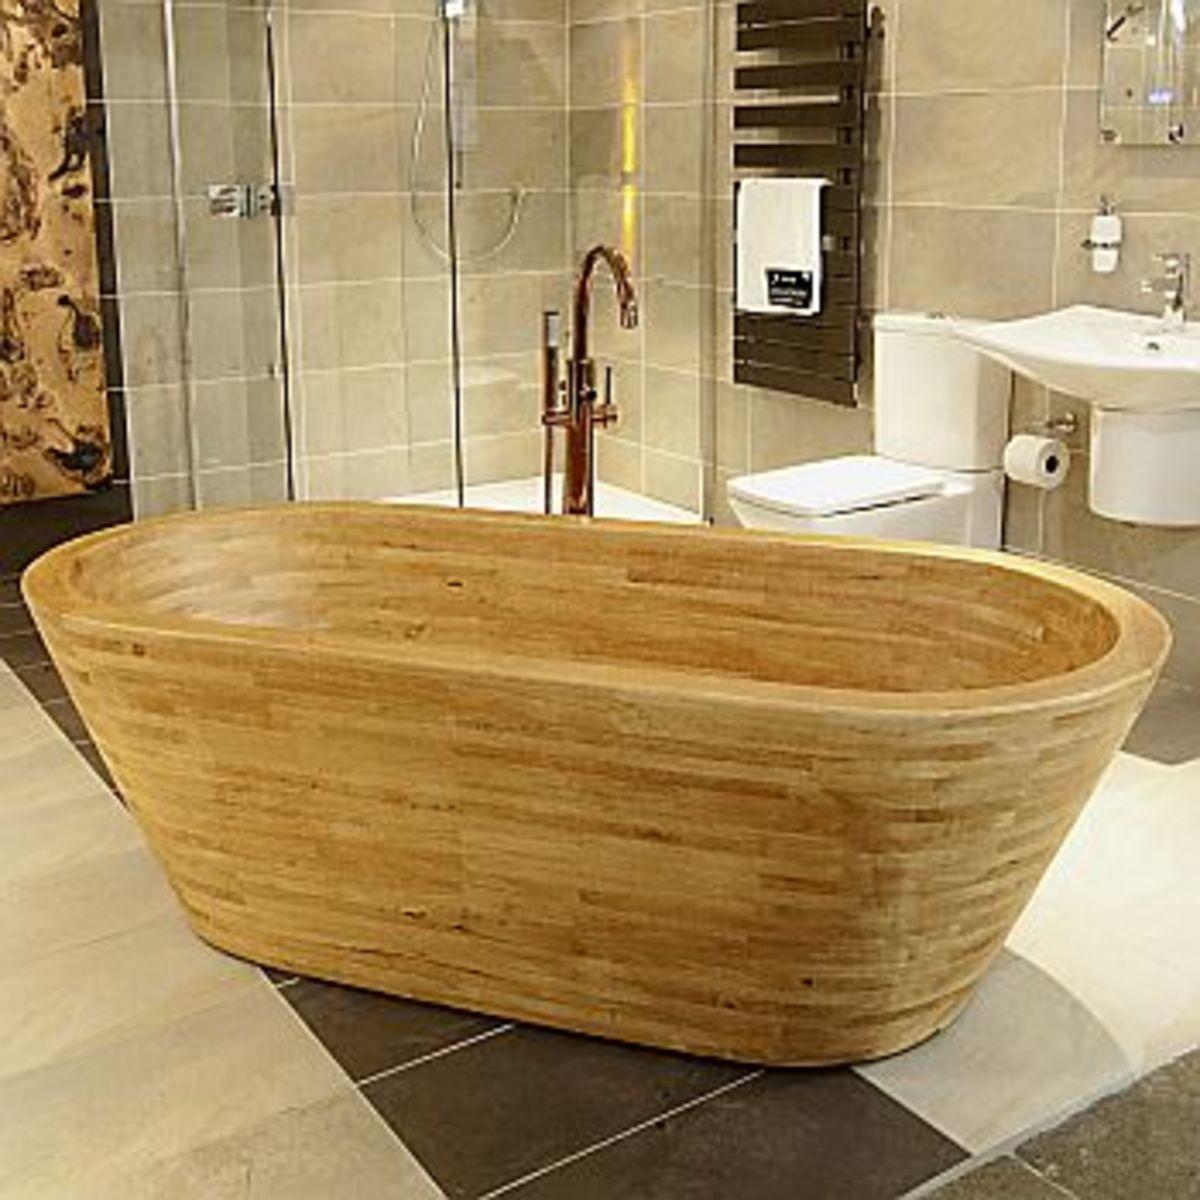 Emperor Oak Wood Bath by Boundary Bathrooms (No longer available!)